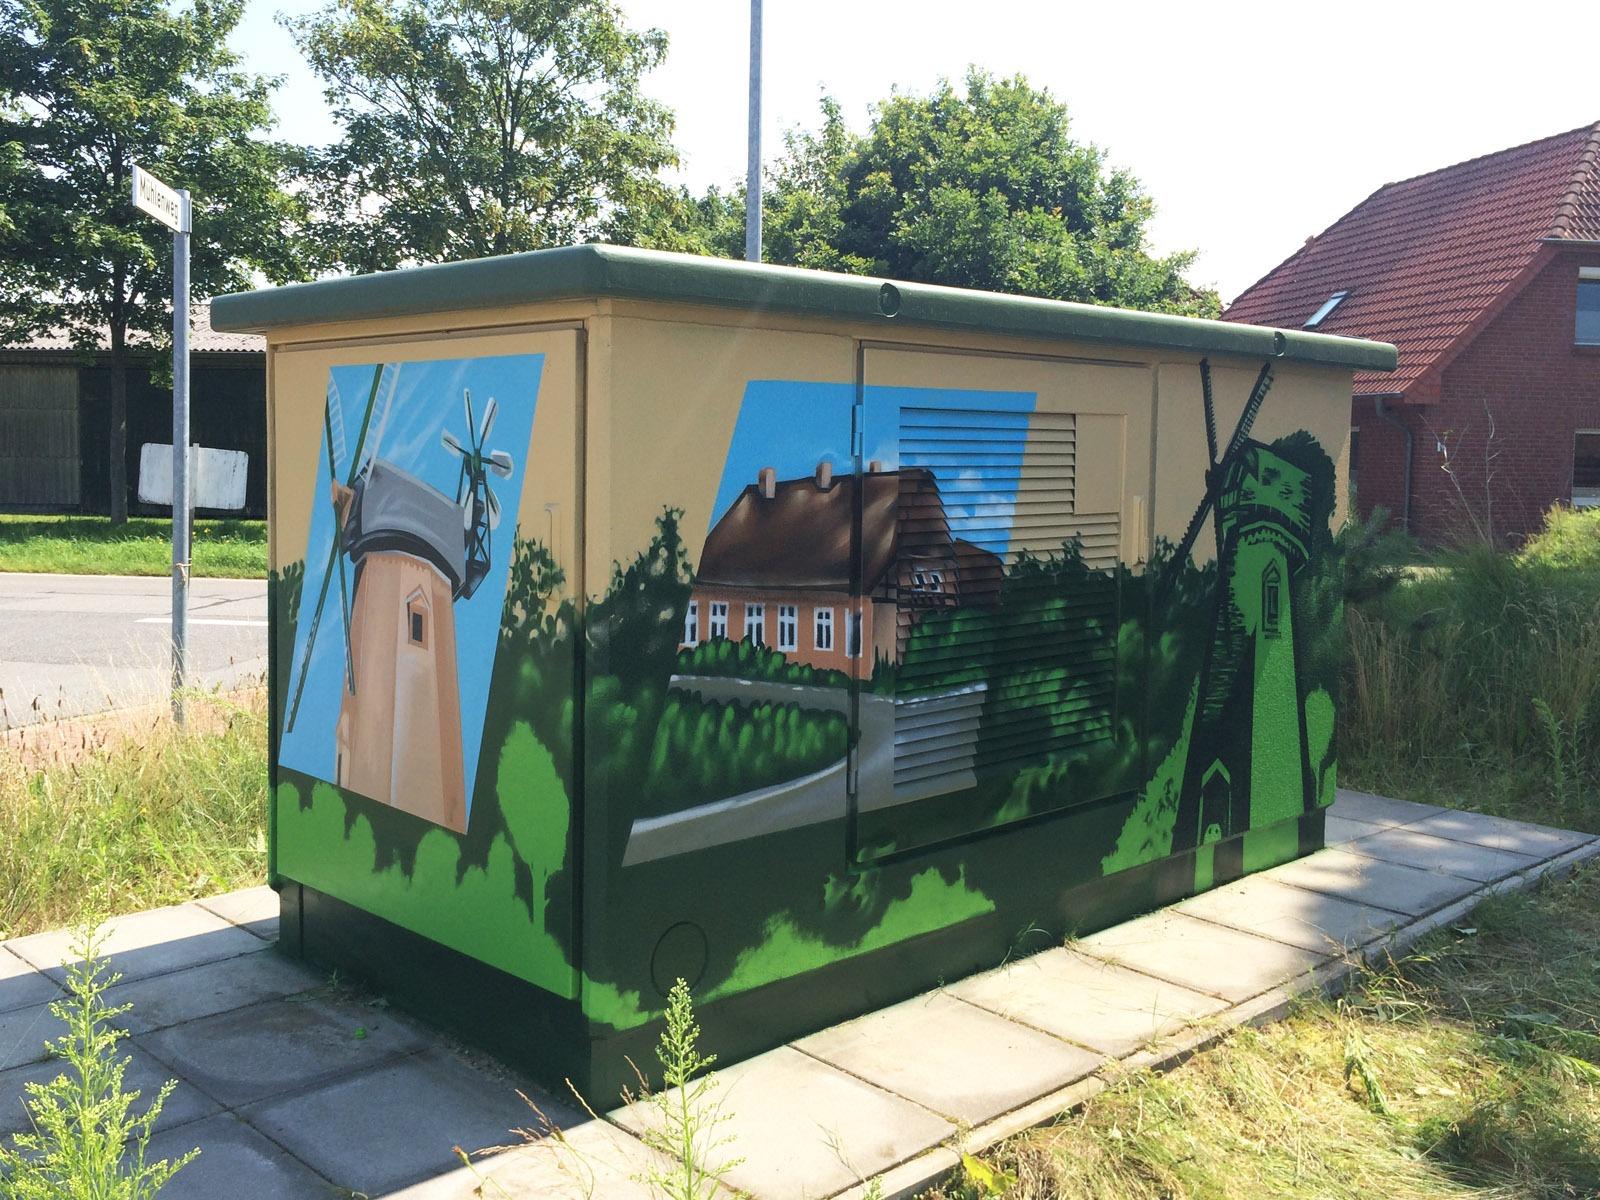 graffitiauftrag-graffitikuenstler-artmos4-hansewerk-2016-landschaft-pflanzen-gruen-beige-illustrativ-aussen-energieversorger